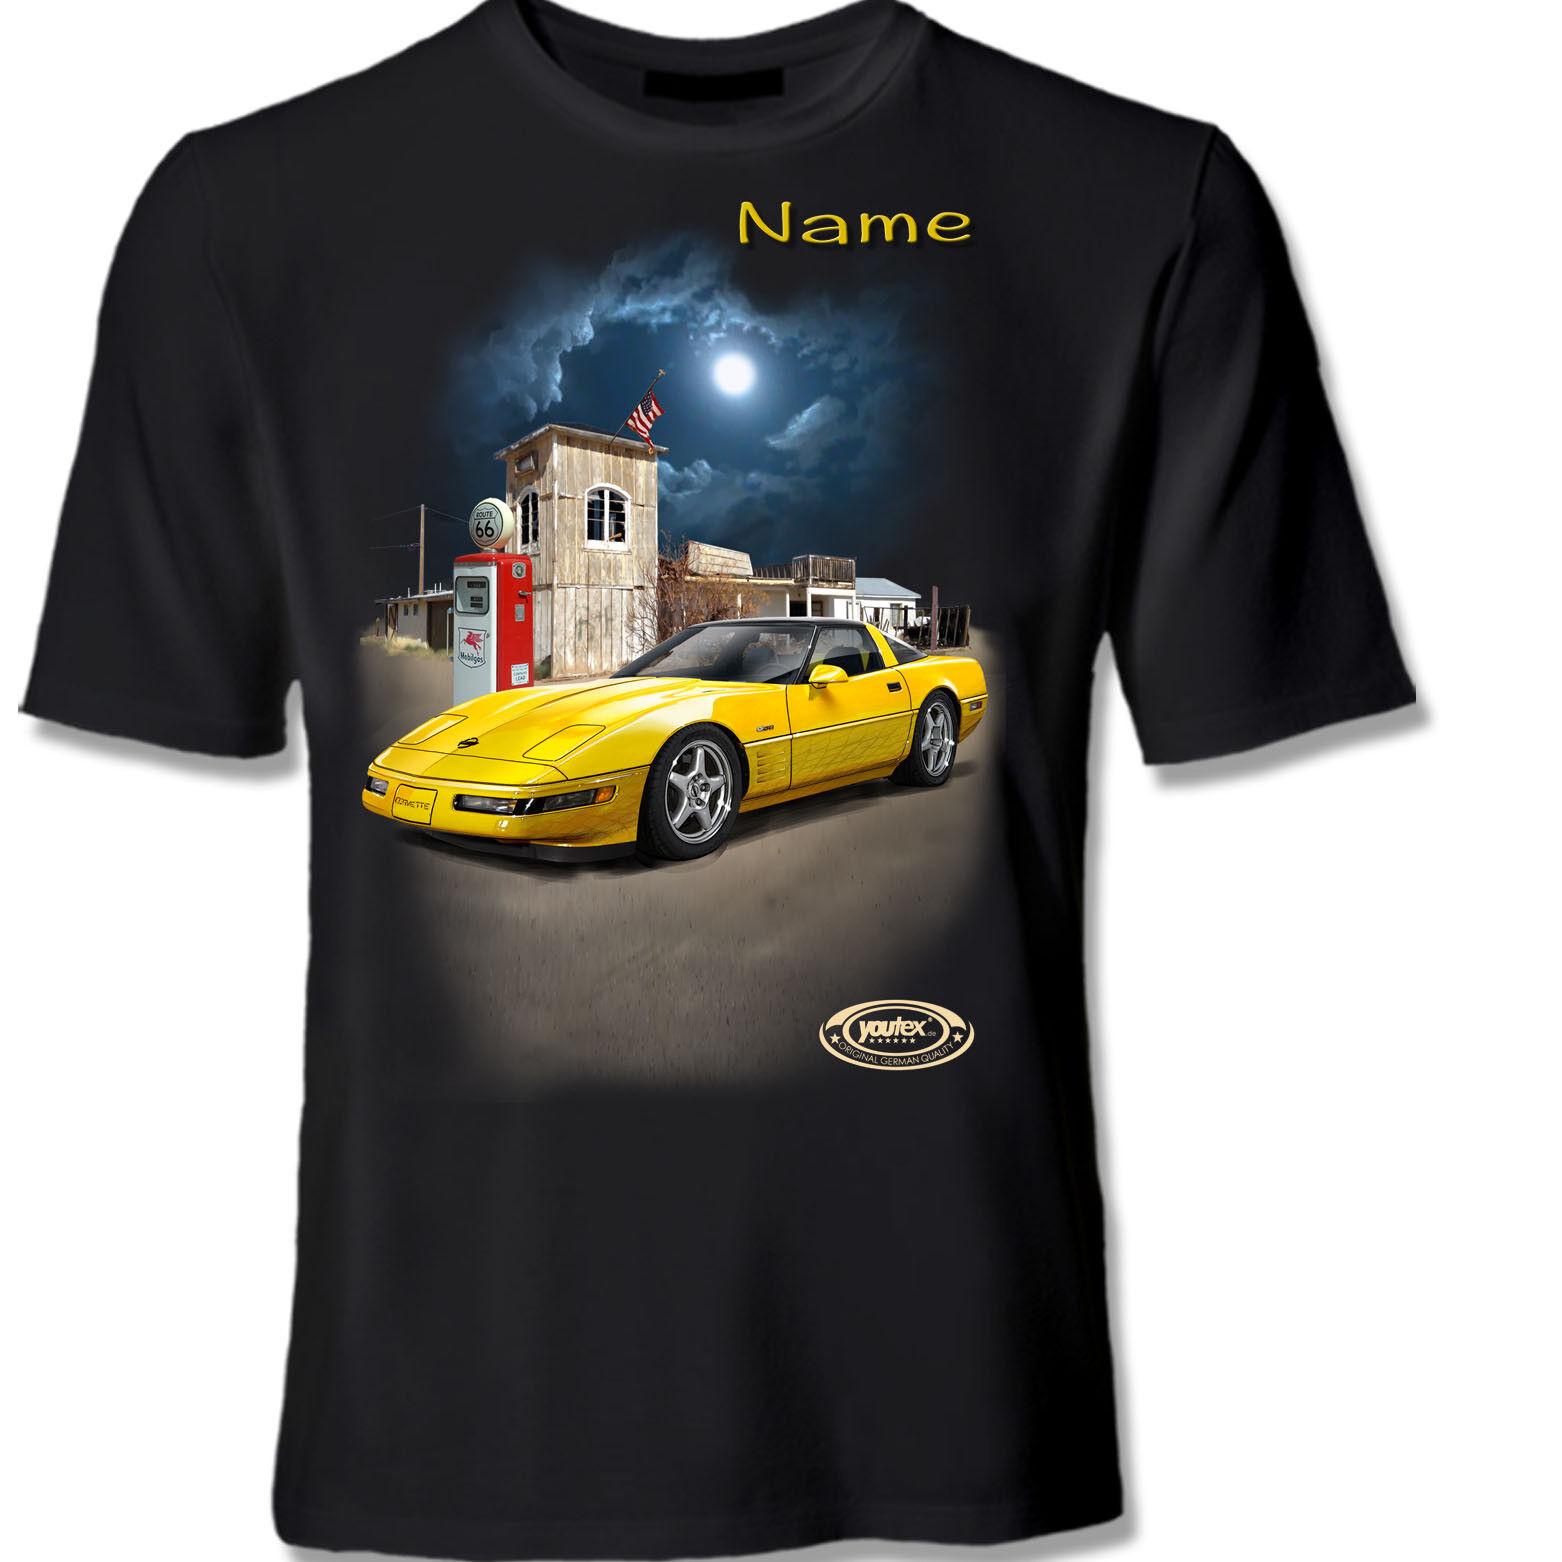 CHEVROLET CORVETTE C4 ZR1 Muscle Car Tuning Auto Shirt T-Shirt original YOUTEX